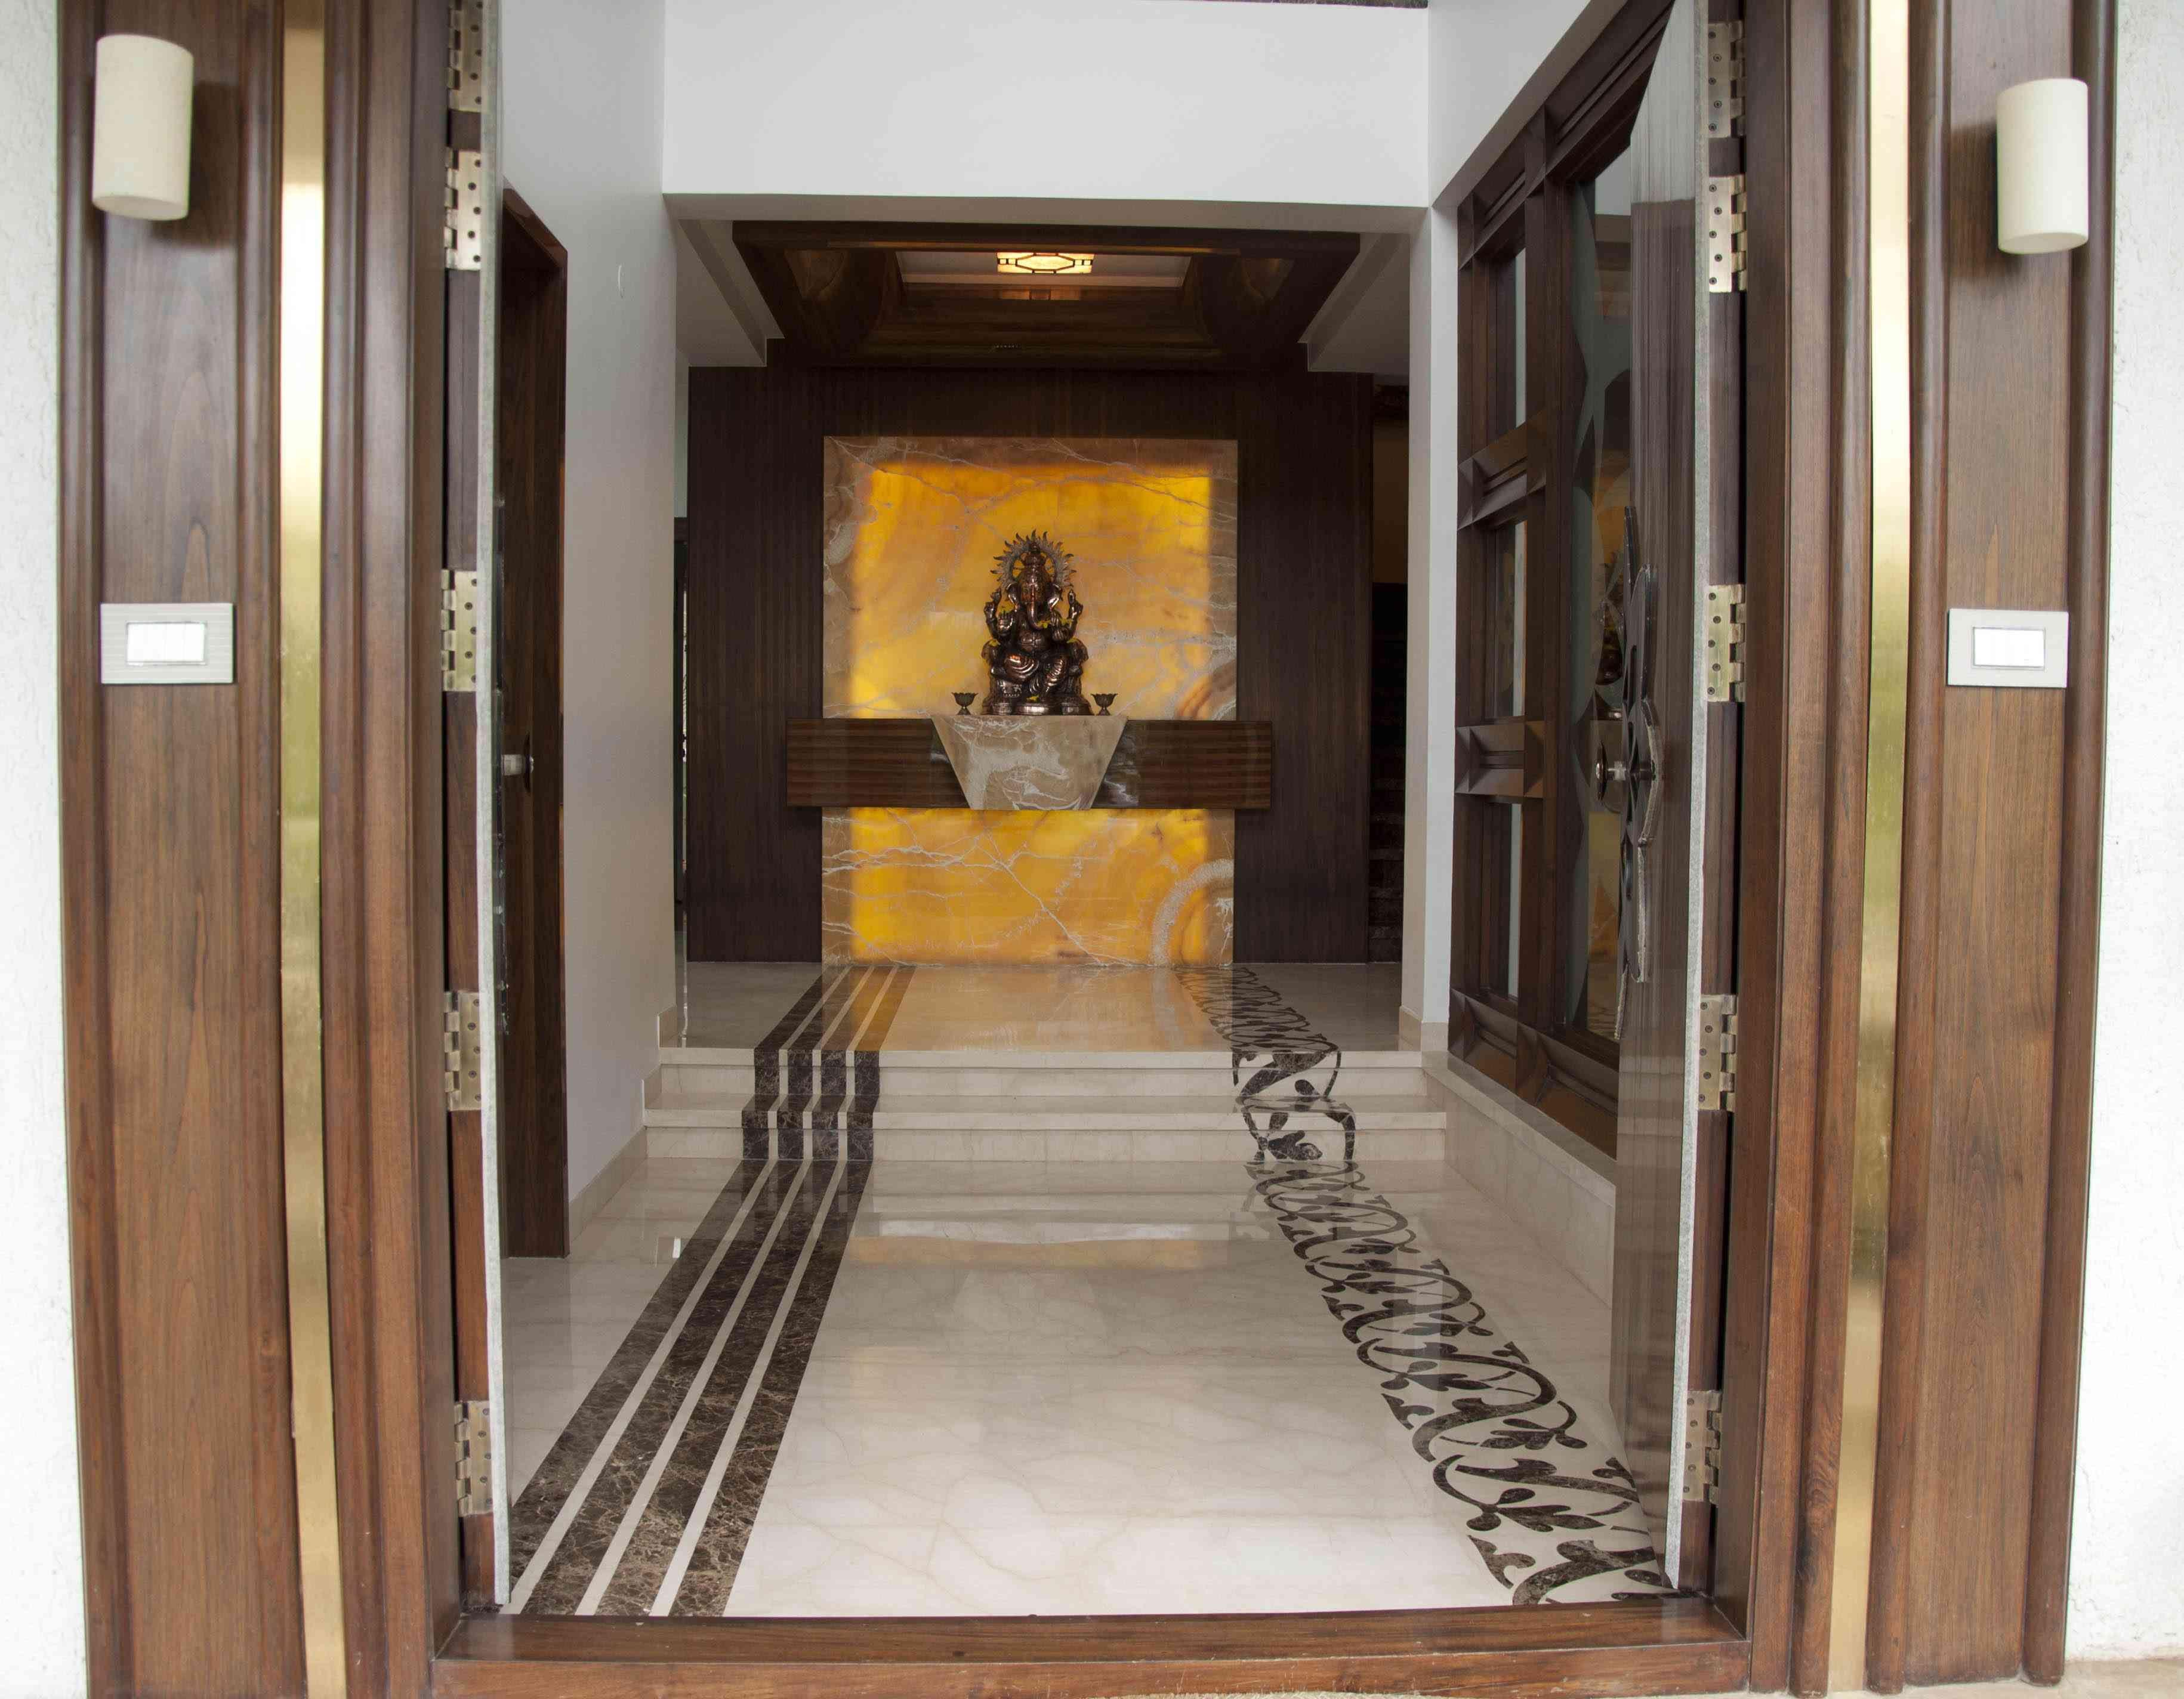 Pooja Mandir For Home Design By Architect: Samanth Gowda, India.